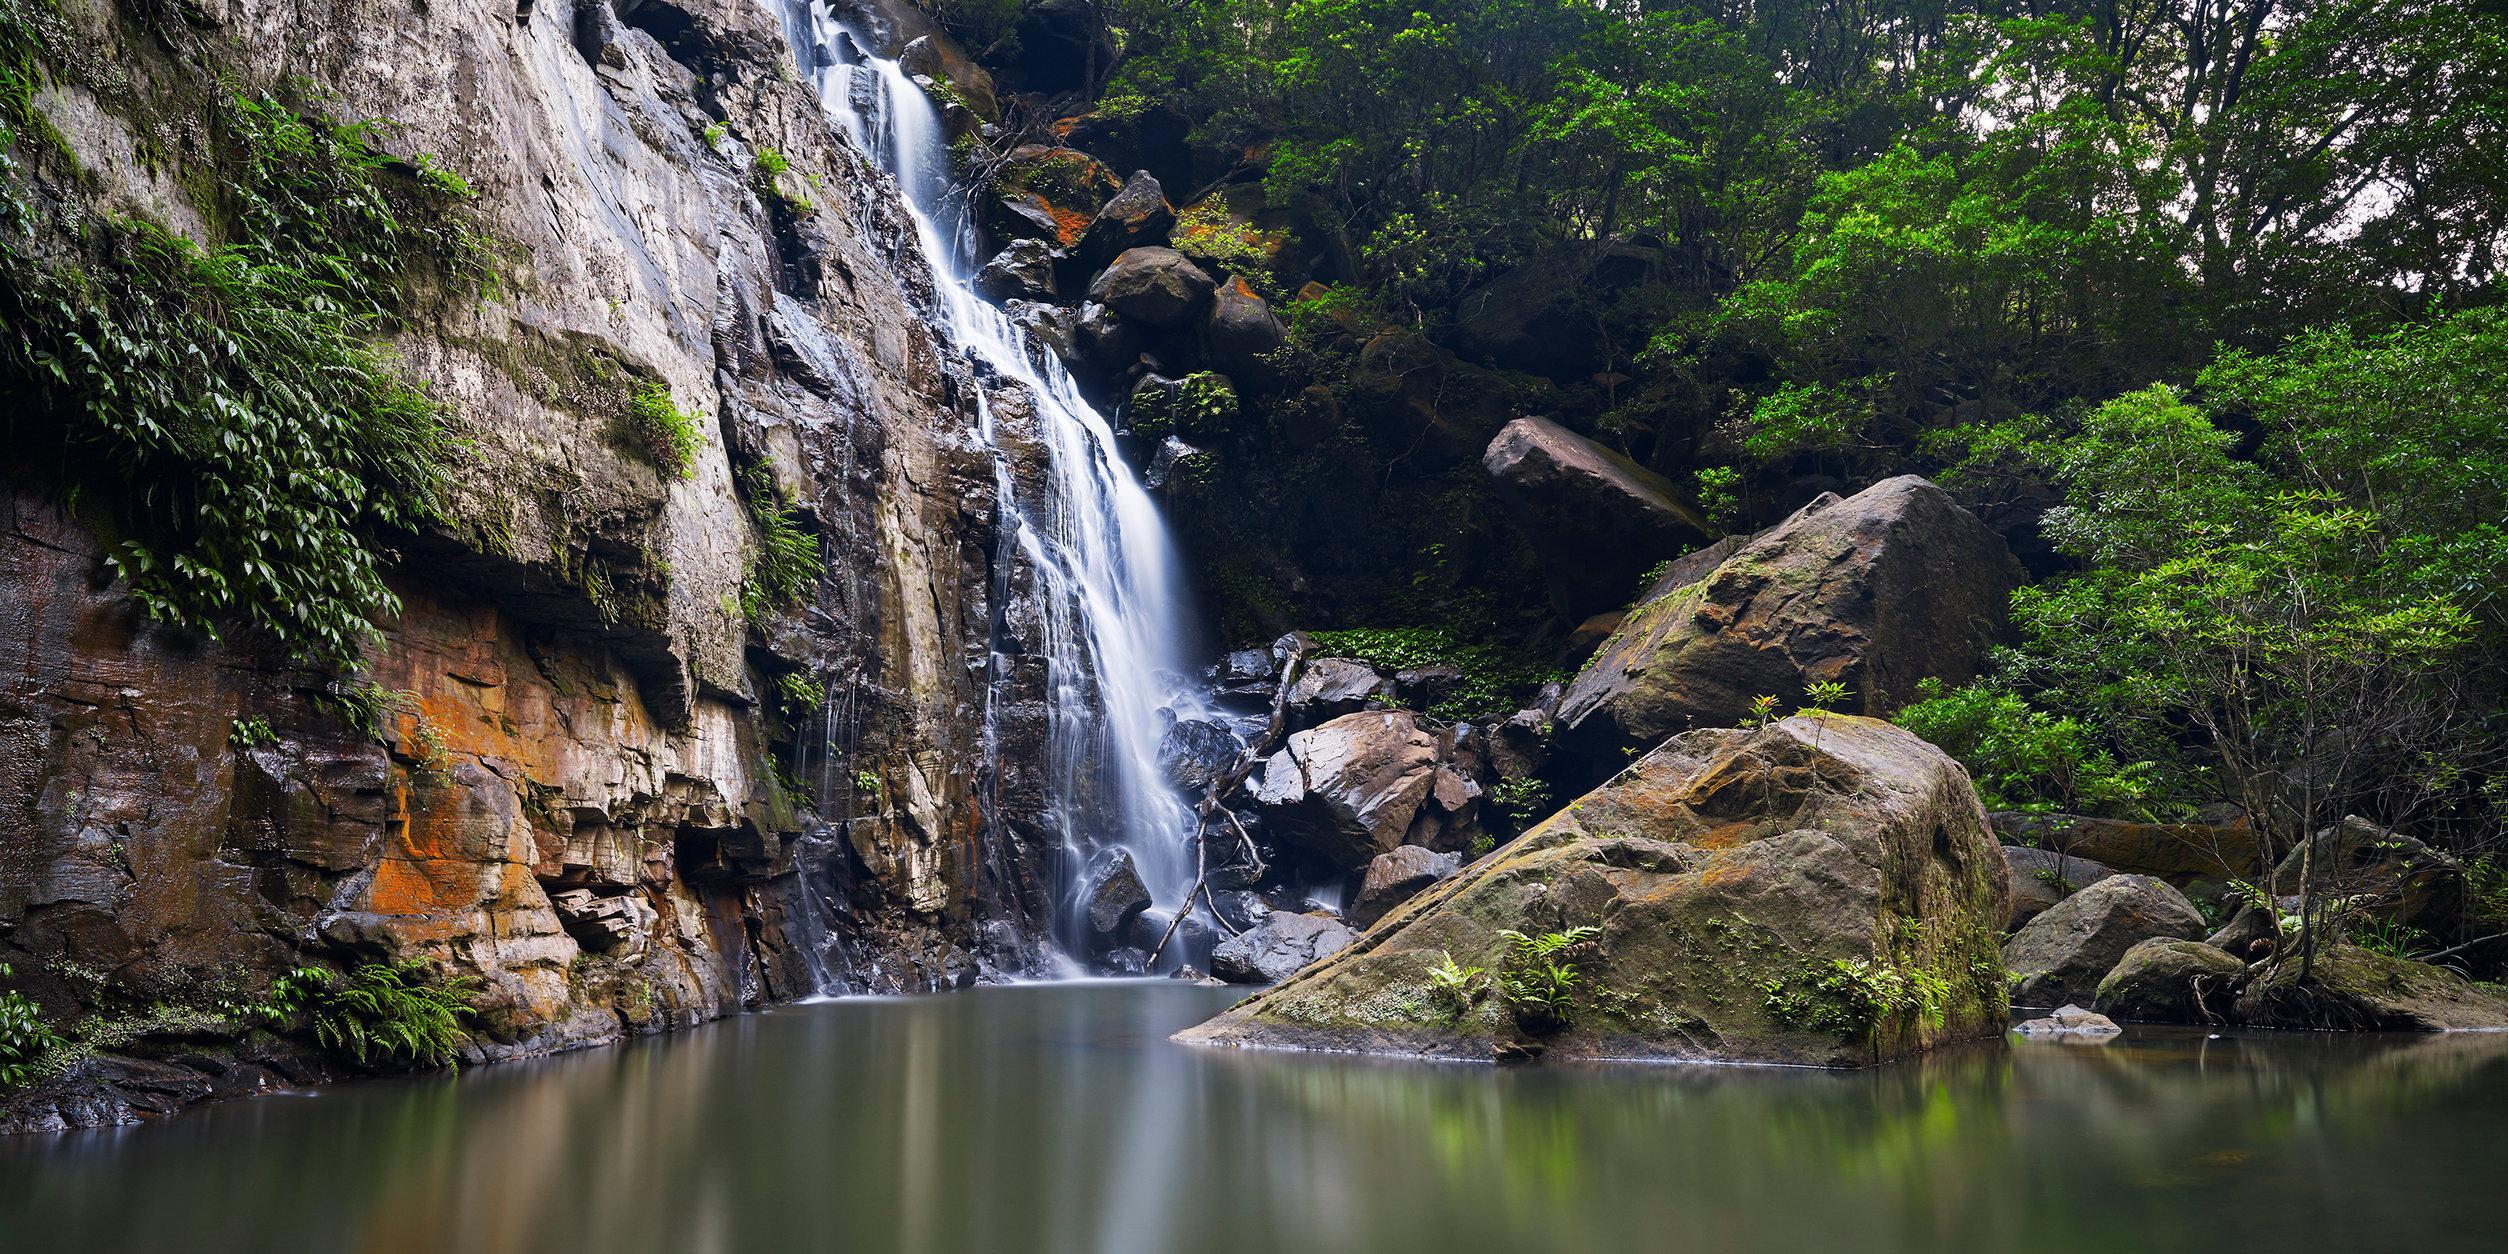 Wild-Swimming-Australia©Swimming-Hole-Fitzroy-Falls_CF083621_Andy-Lewis_PrintCrop.jpg